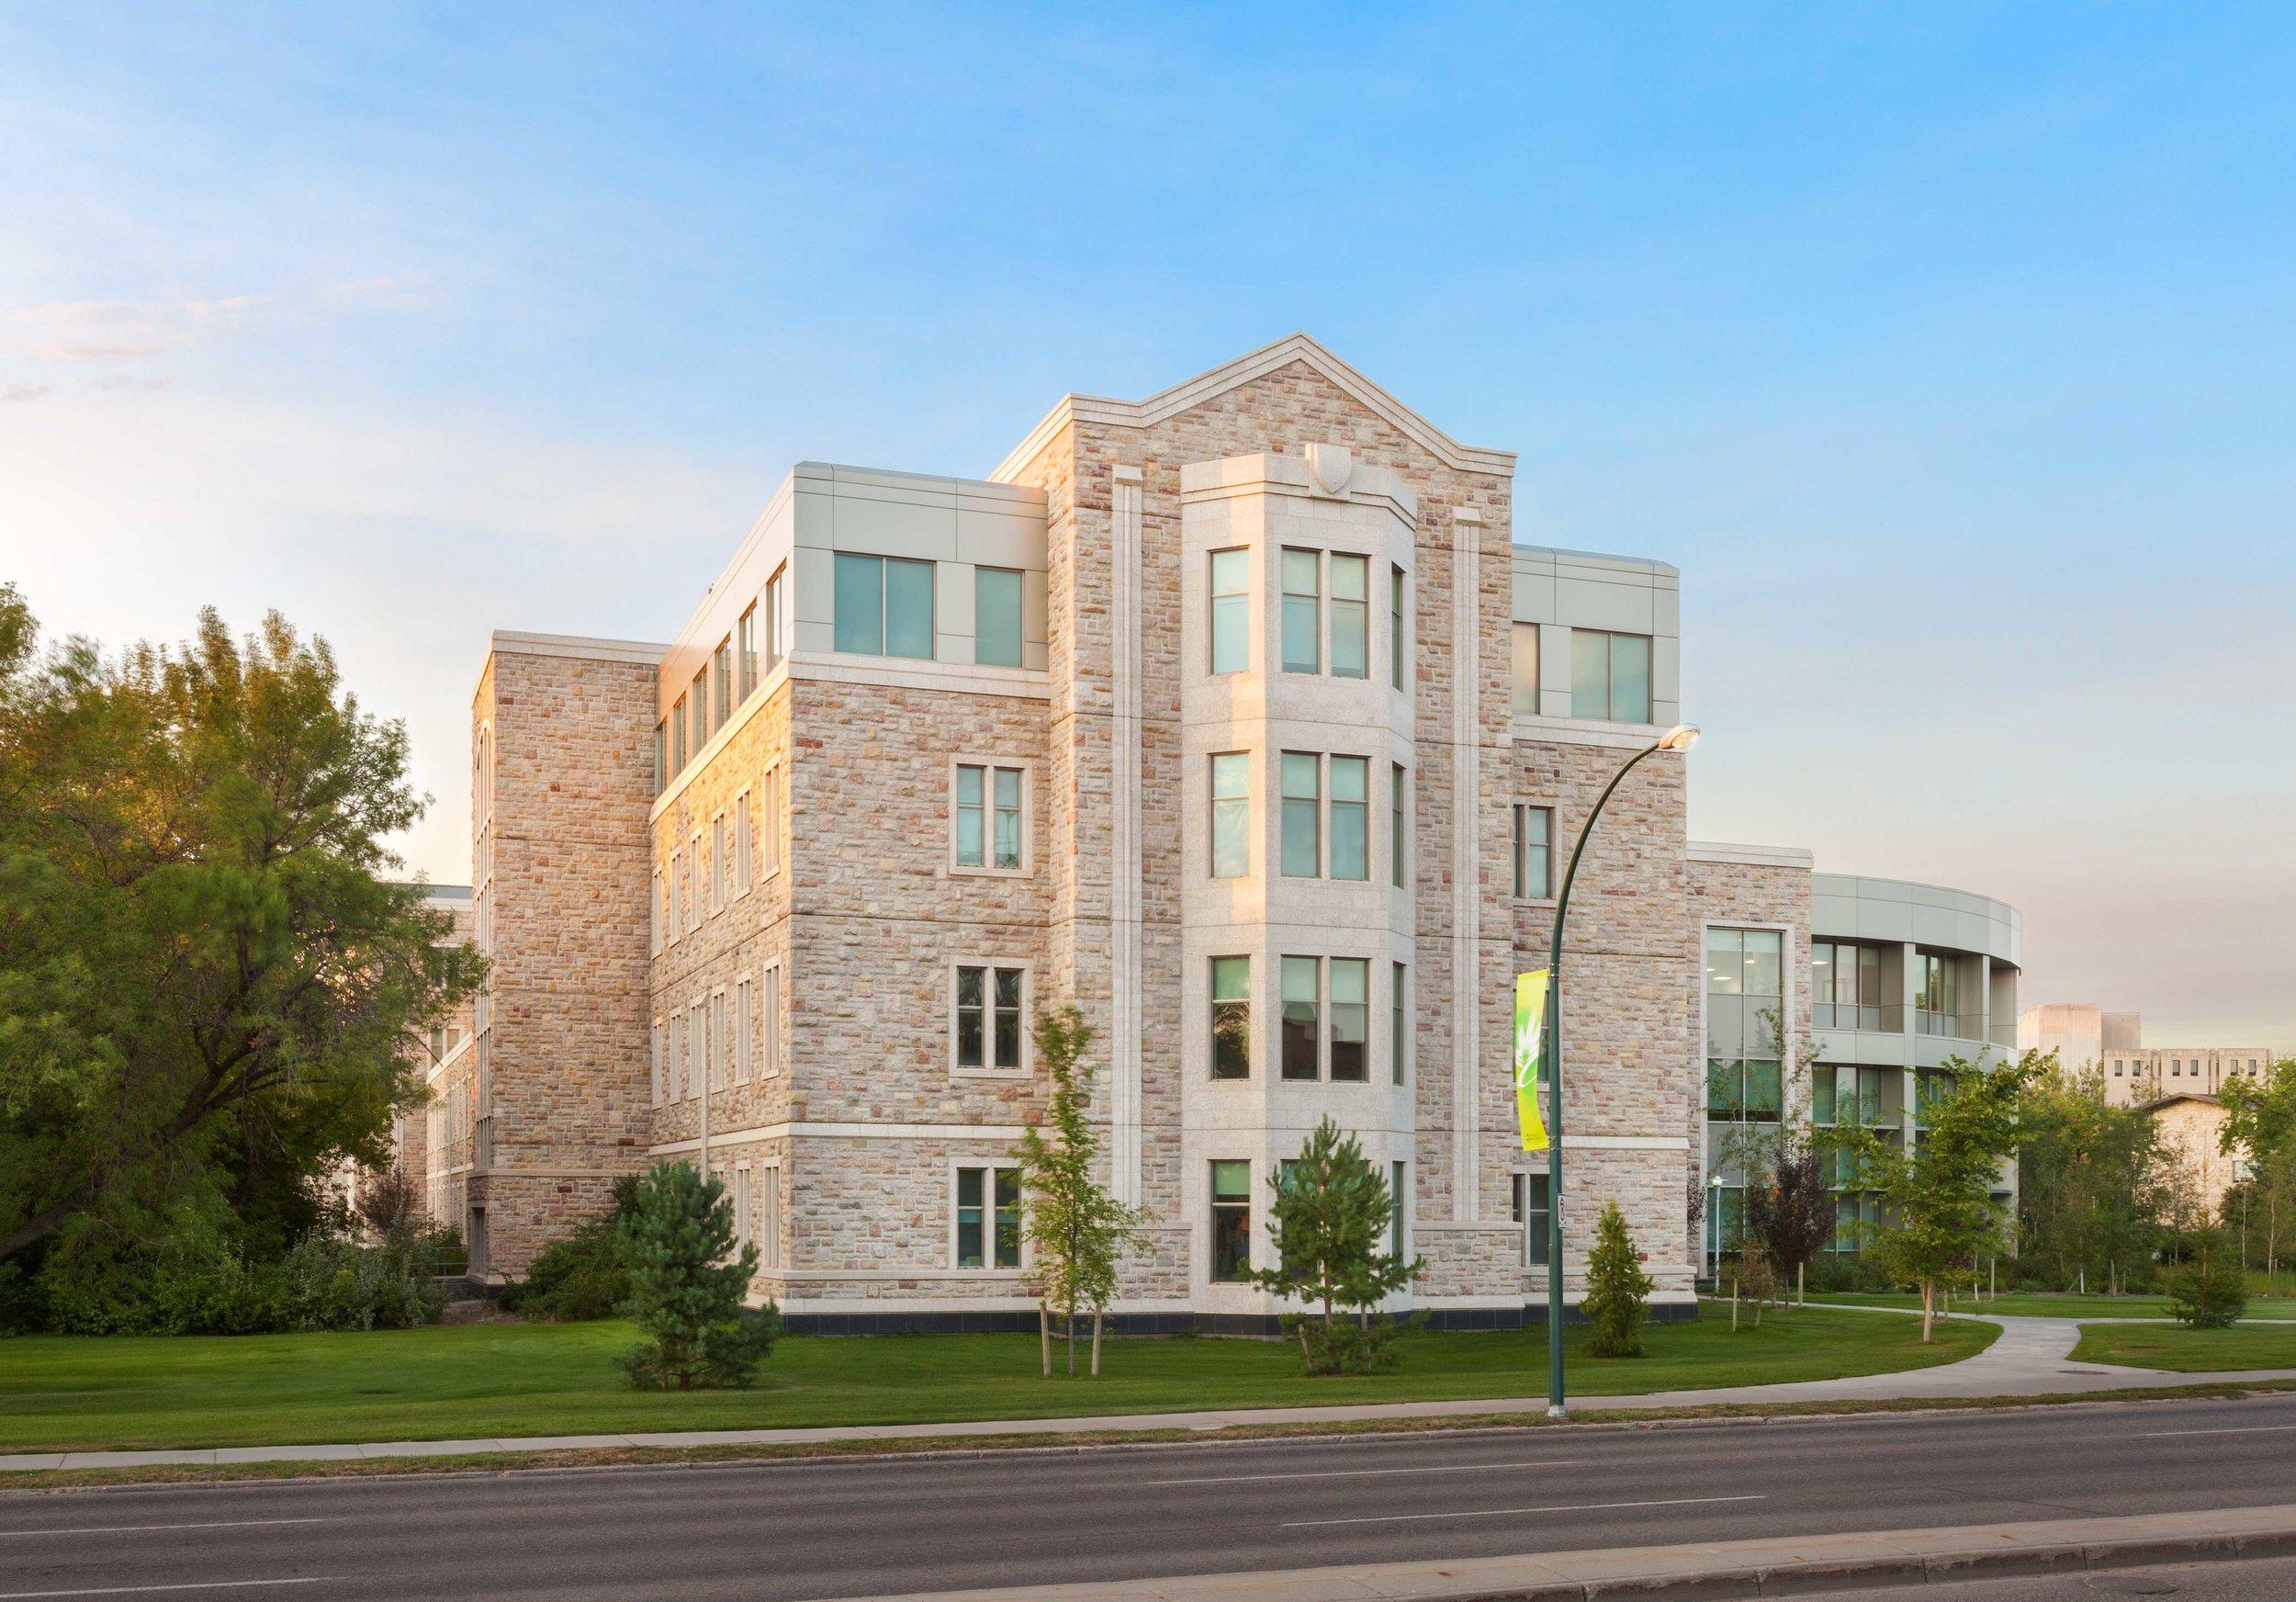 University of Saskatchewan Academic Health Sciences E-Wing Saskatoon, SK